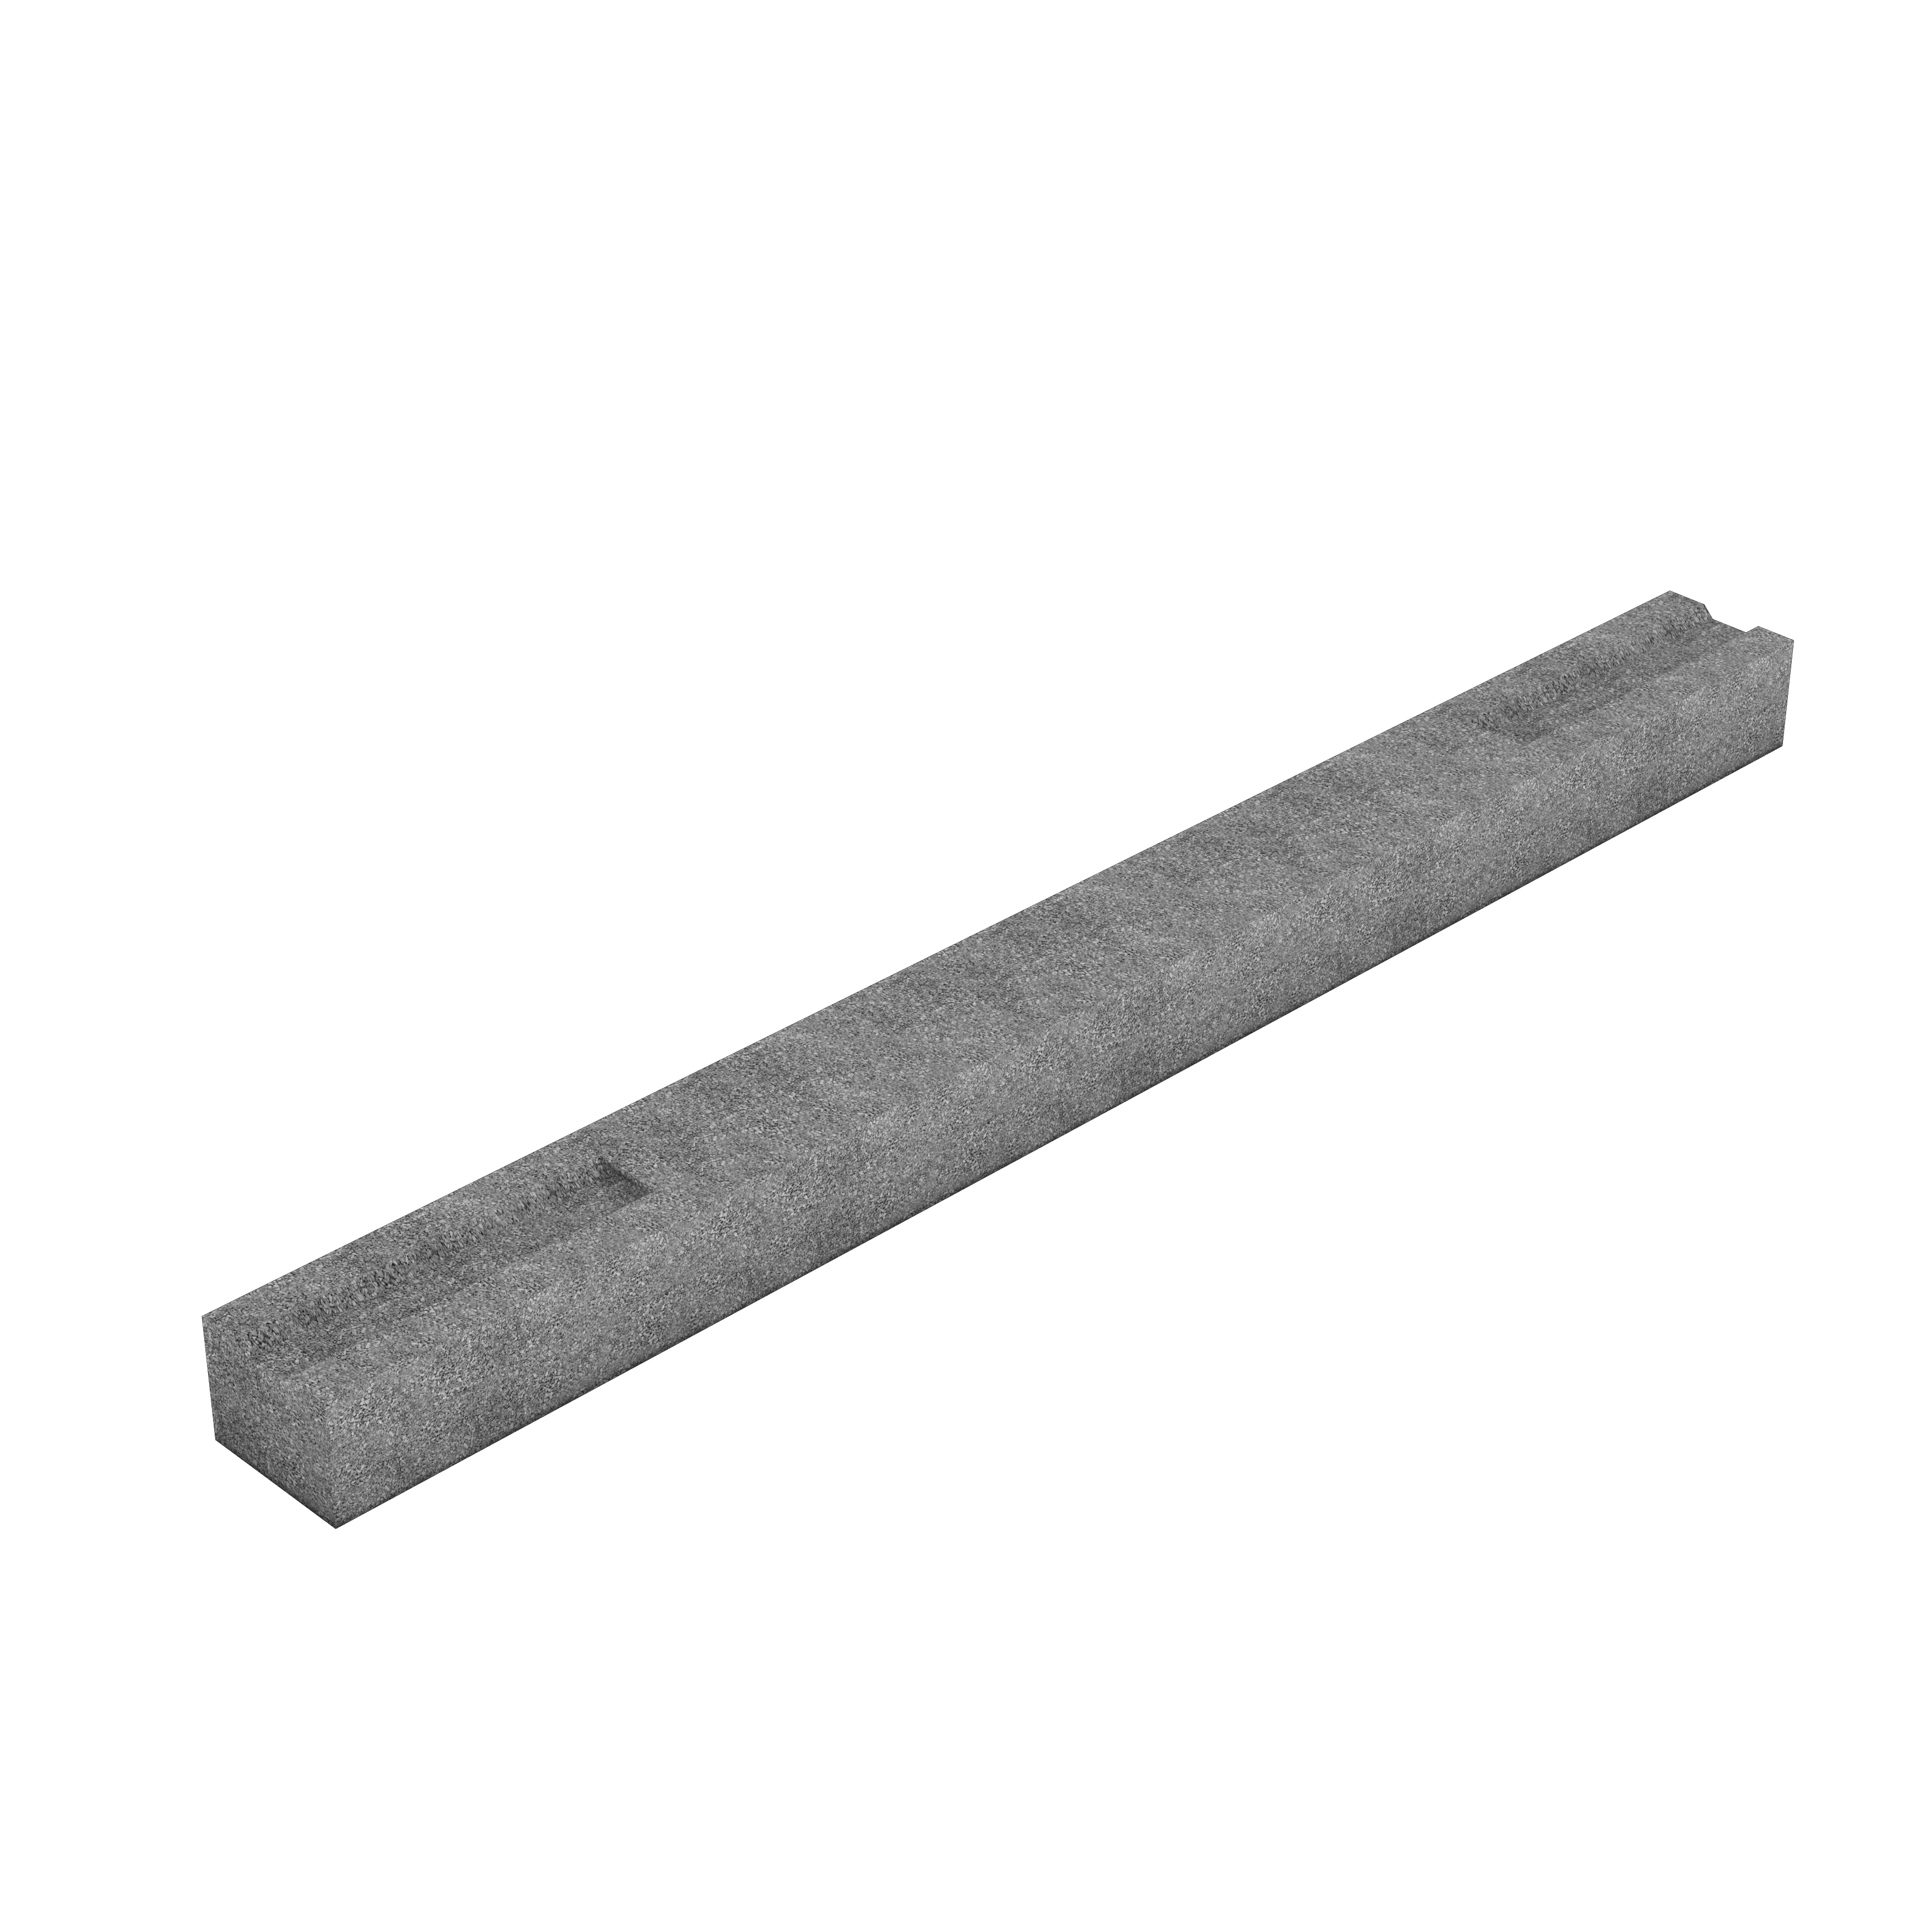 HB-Priima130 aukonylityspalkki 1,5